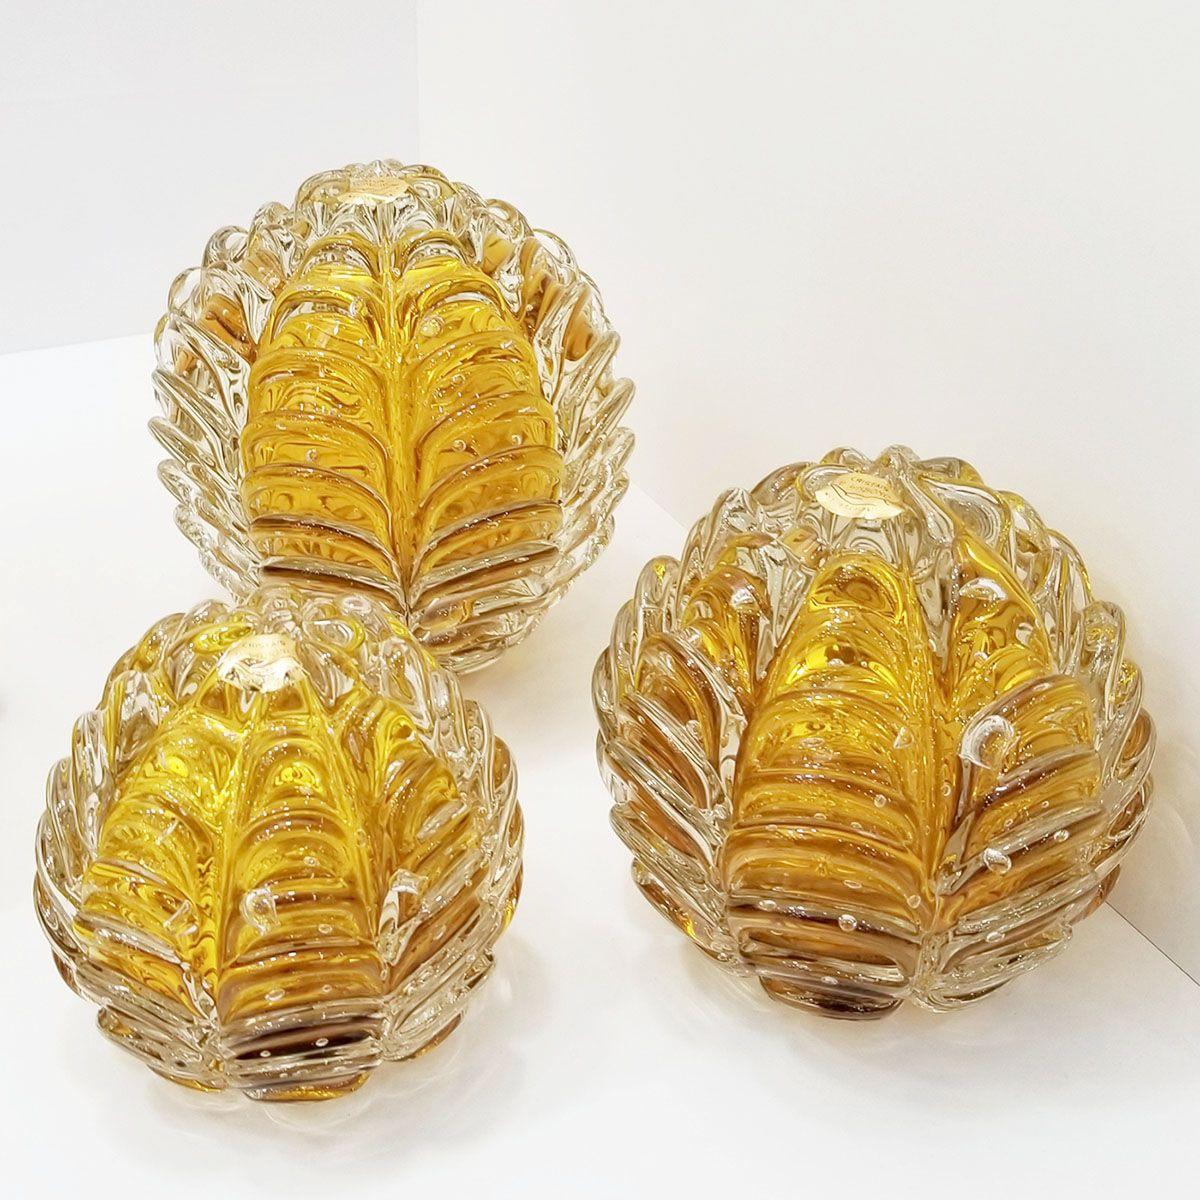 Peso de Cristal Murano D'labone - Cristal Âmbar Sensation 10cm